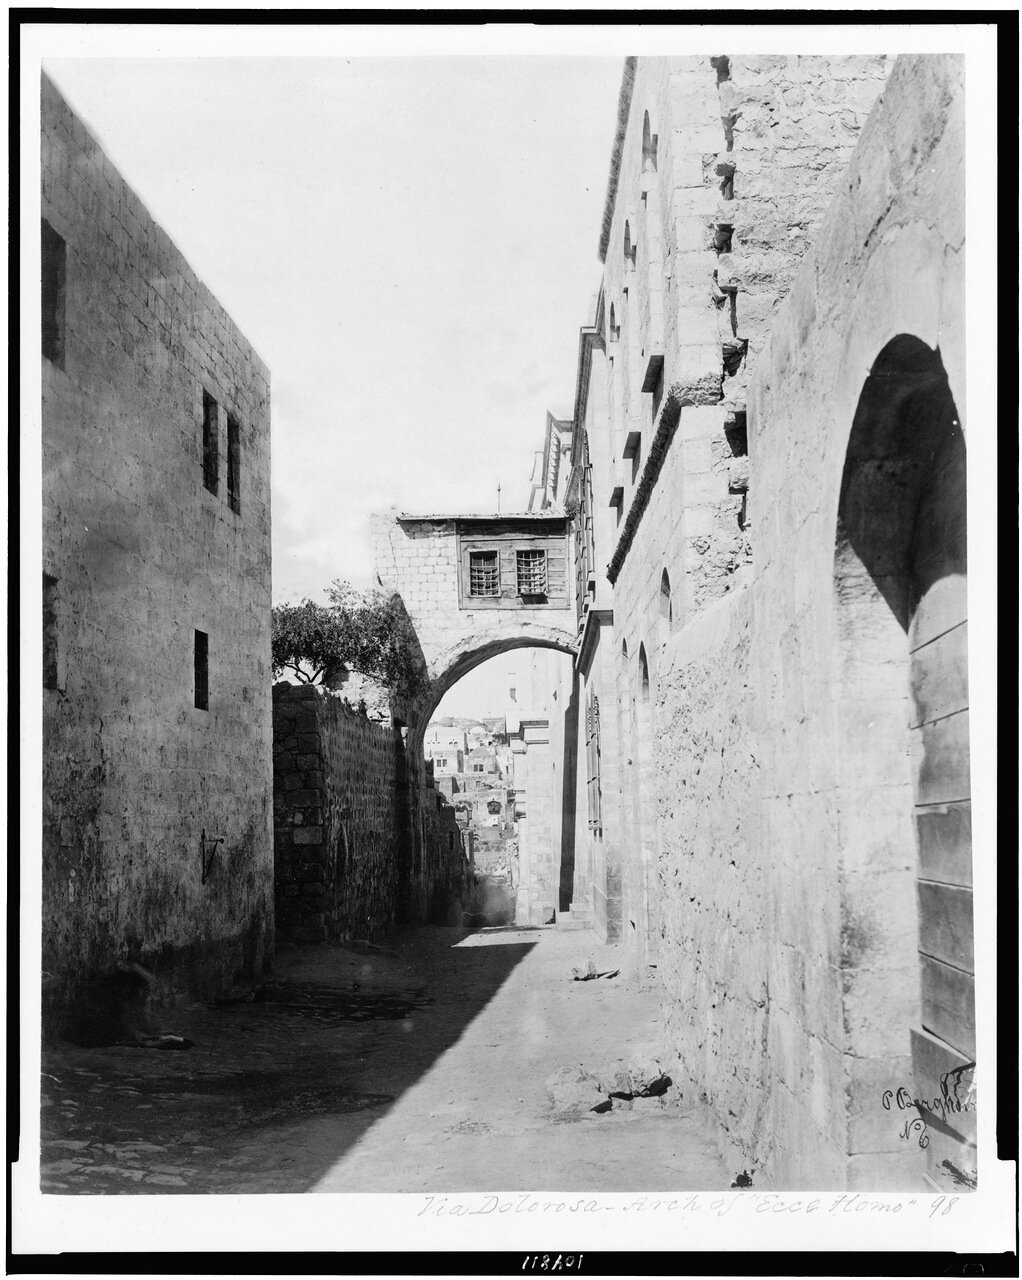 Виа Делароса. Арка Эссе Хомо, 1870-е гг.